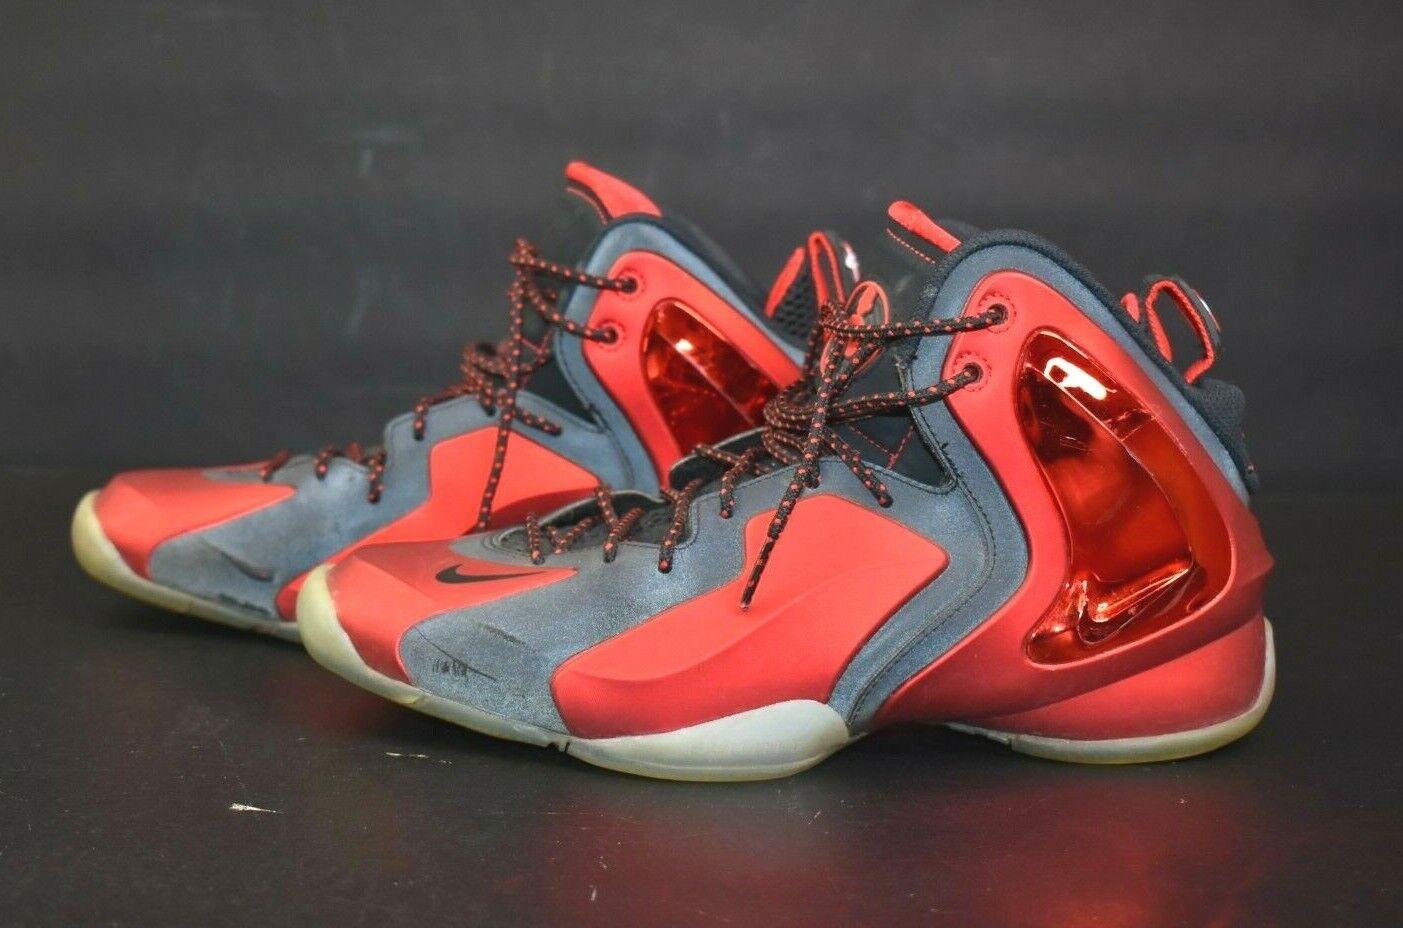 bffb0922465 Nike Men s Sz 9 Lil Penny Posite University Air Basketball Shoes ...